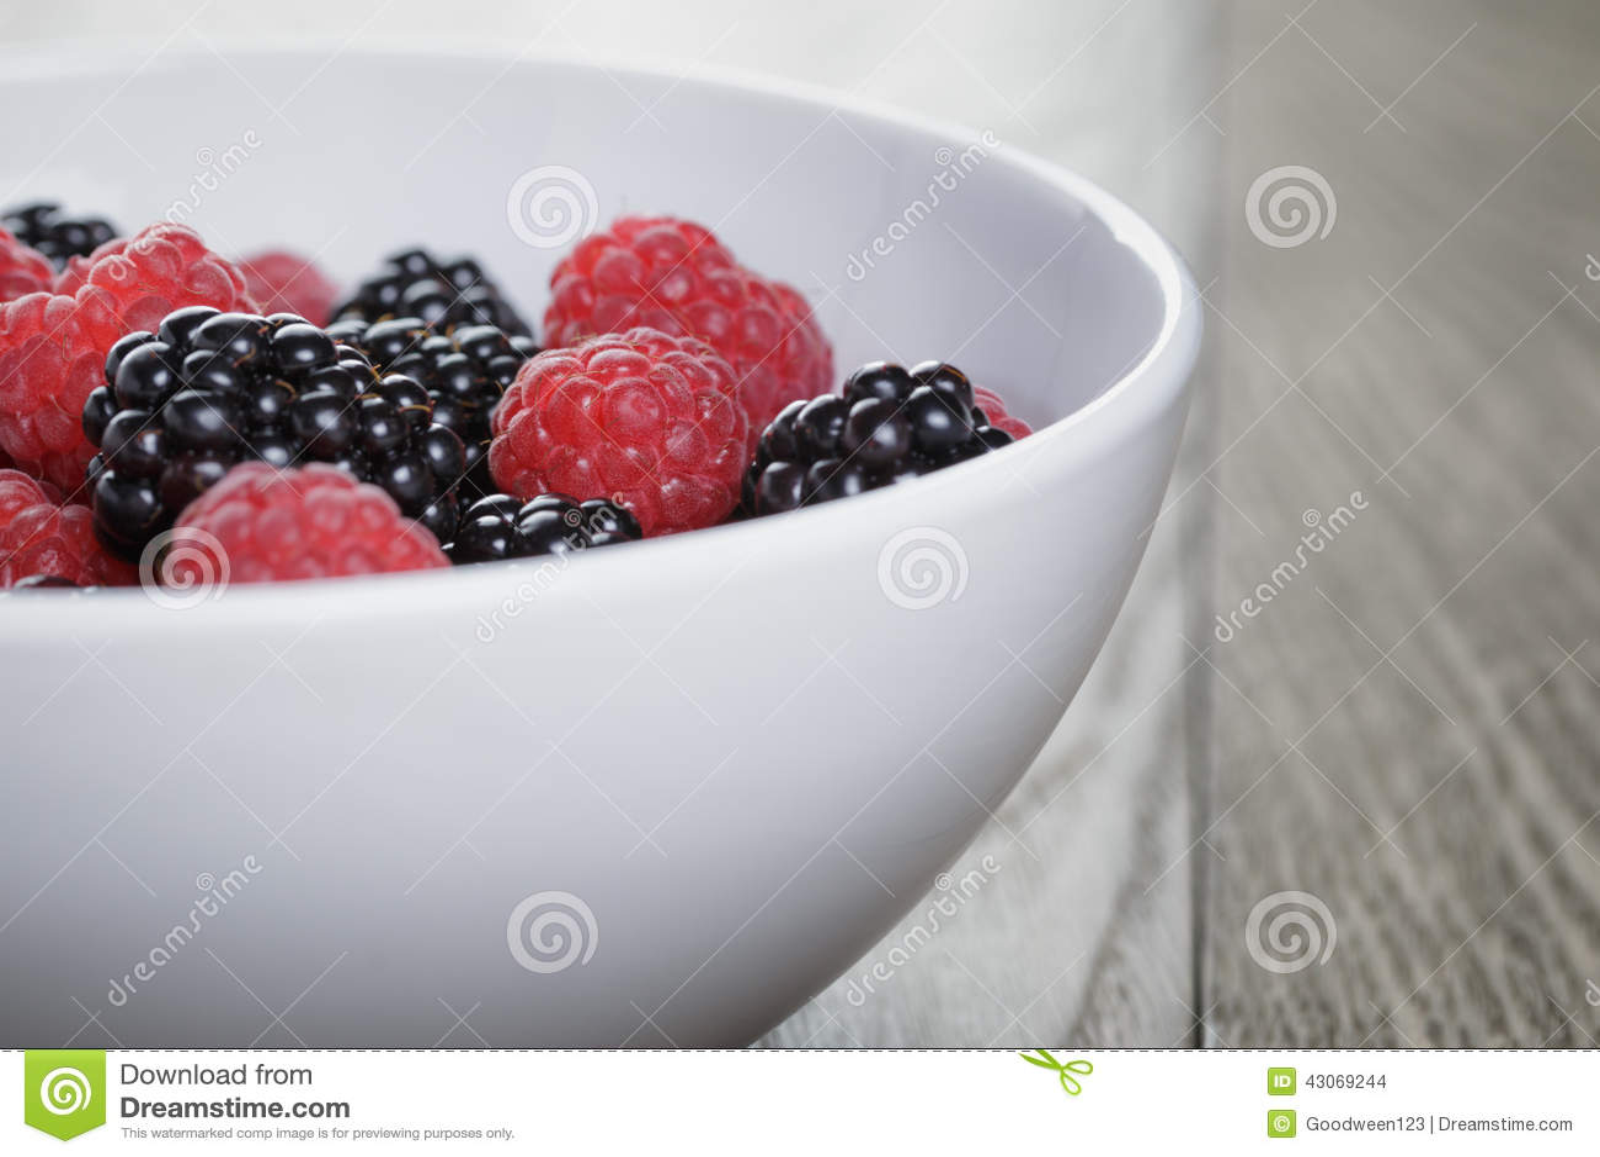 Ripe blackberries and raspberries in white bowl on old oak table